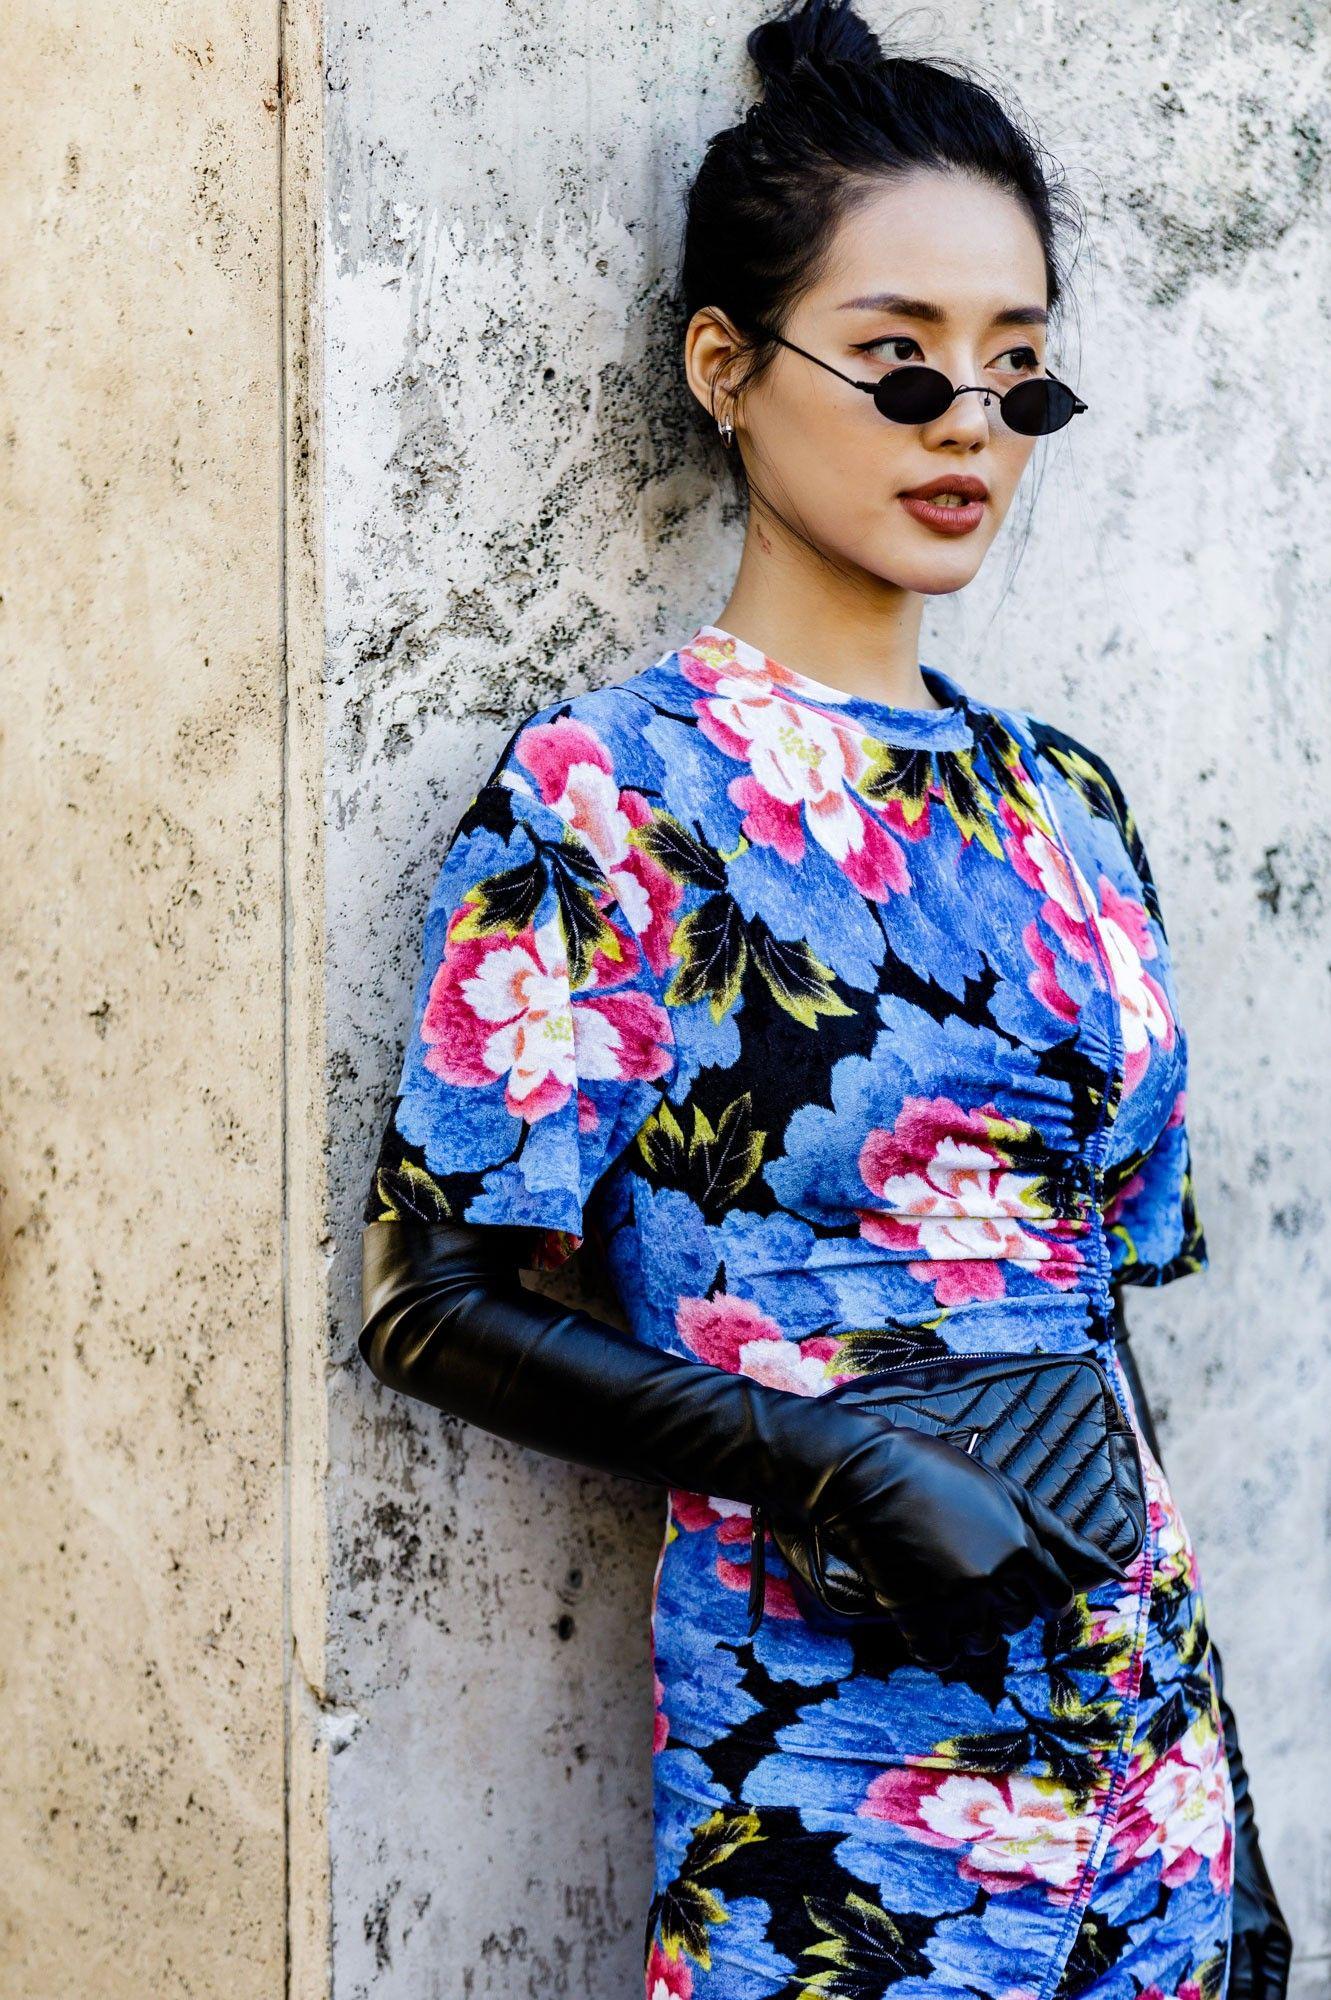 Pin By Major Tricolour On Street Style Bloggers Fashion Cool Street Fashion Paris Fashion Week